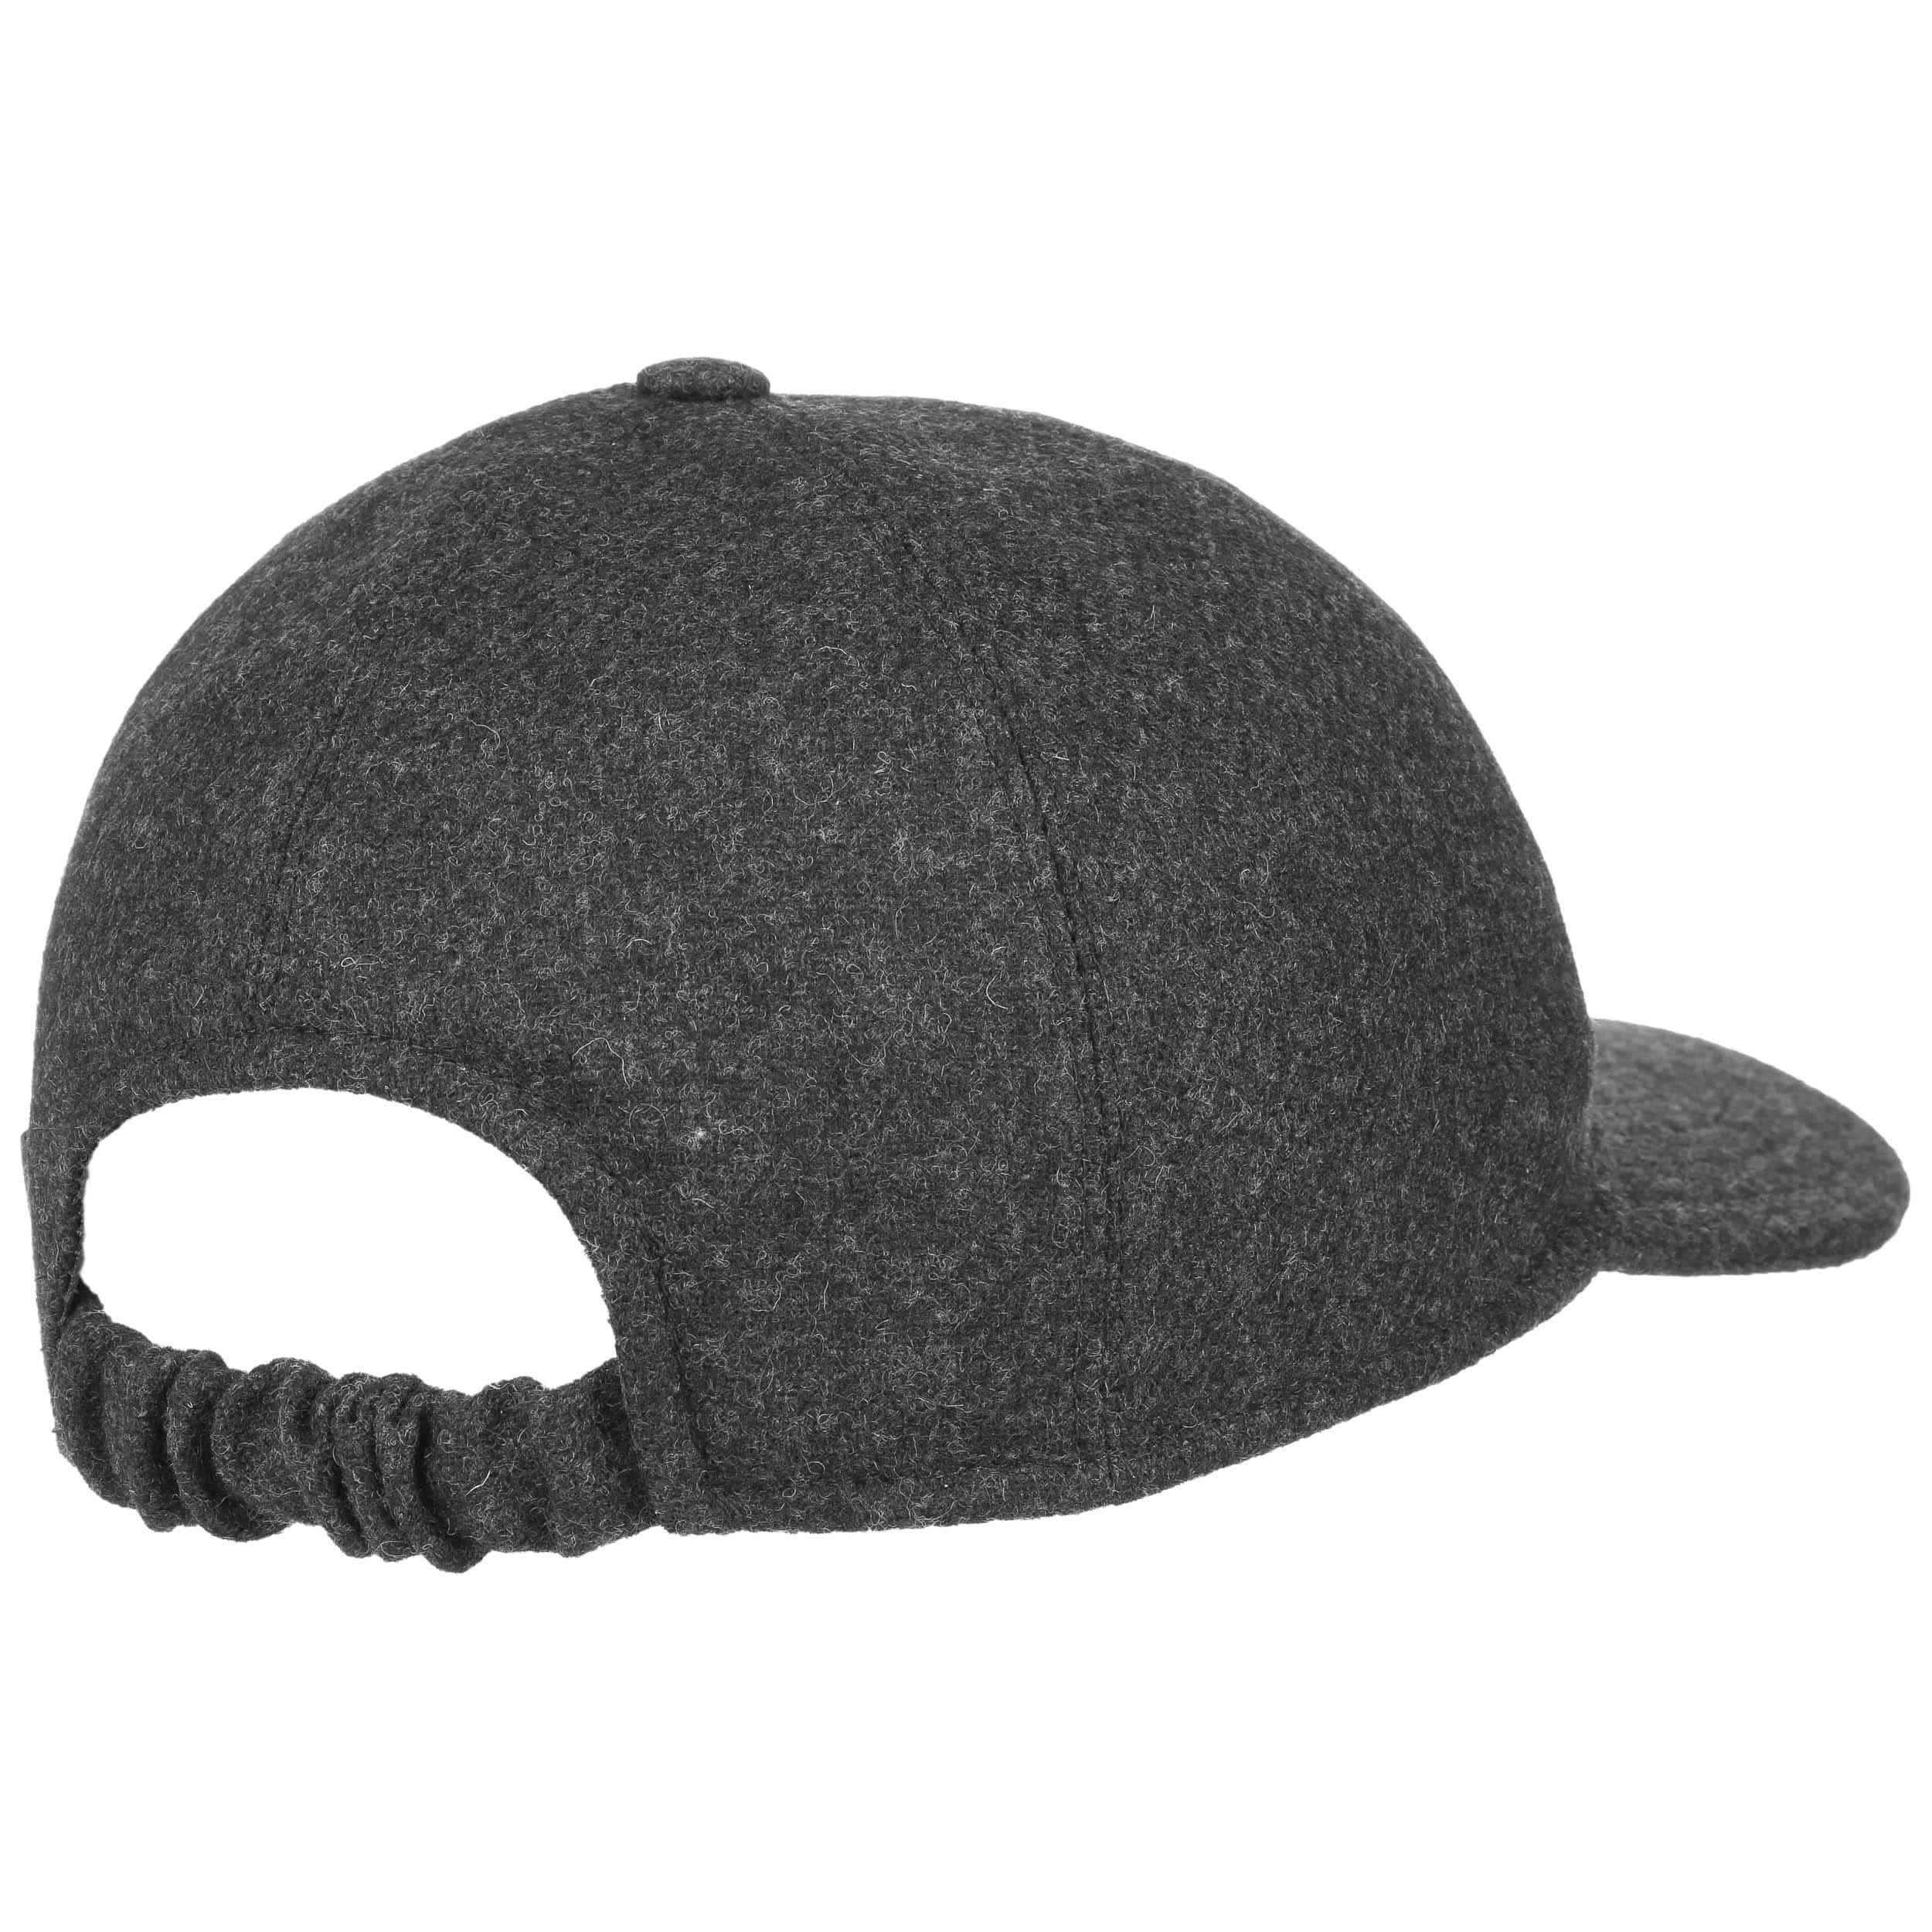 Gorra de Lana Fabio Uni Wool by Borsalino - Gorras - sombreroshop.es 6a6fdfb81c0